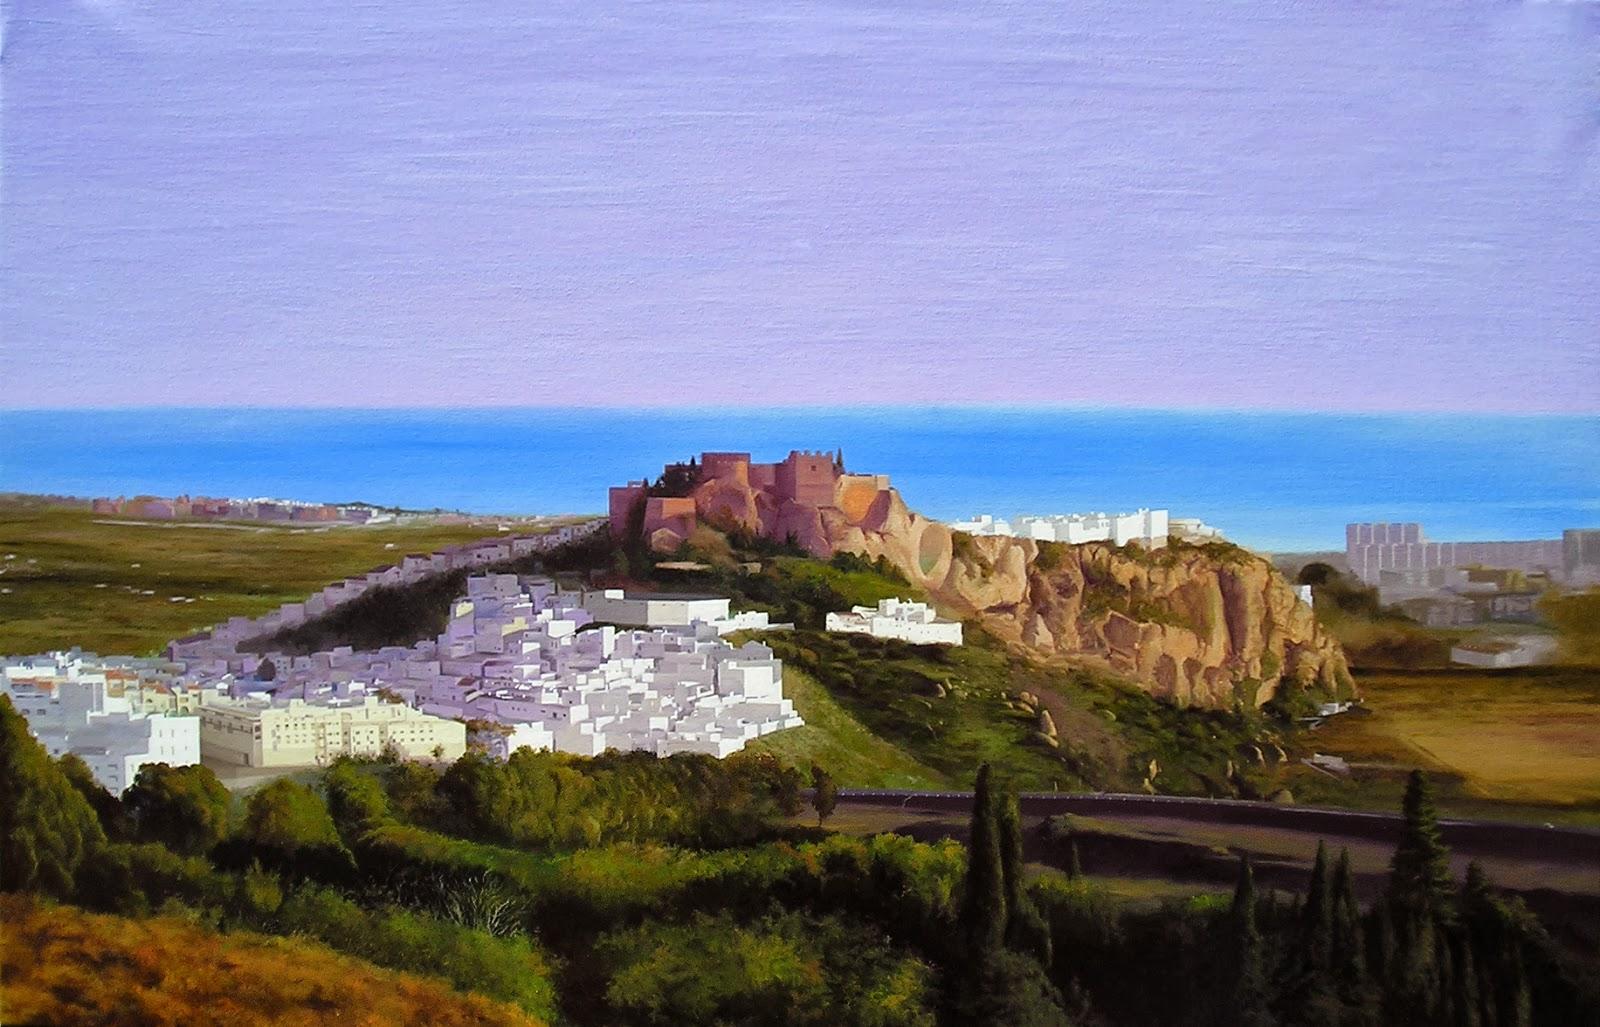 David morales artblog salobre a for Landscaping rocks vallejo ca